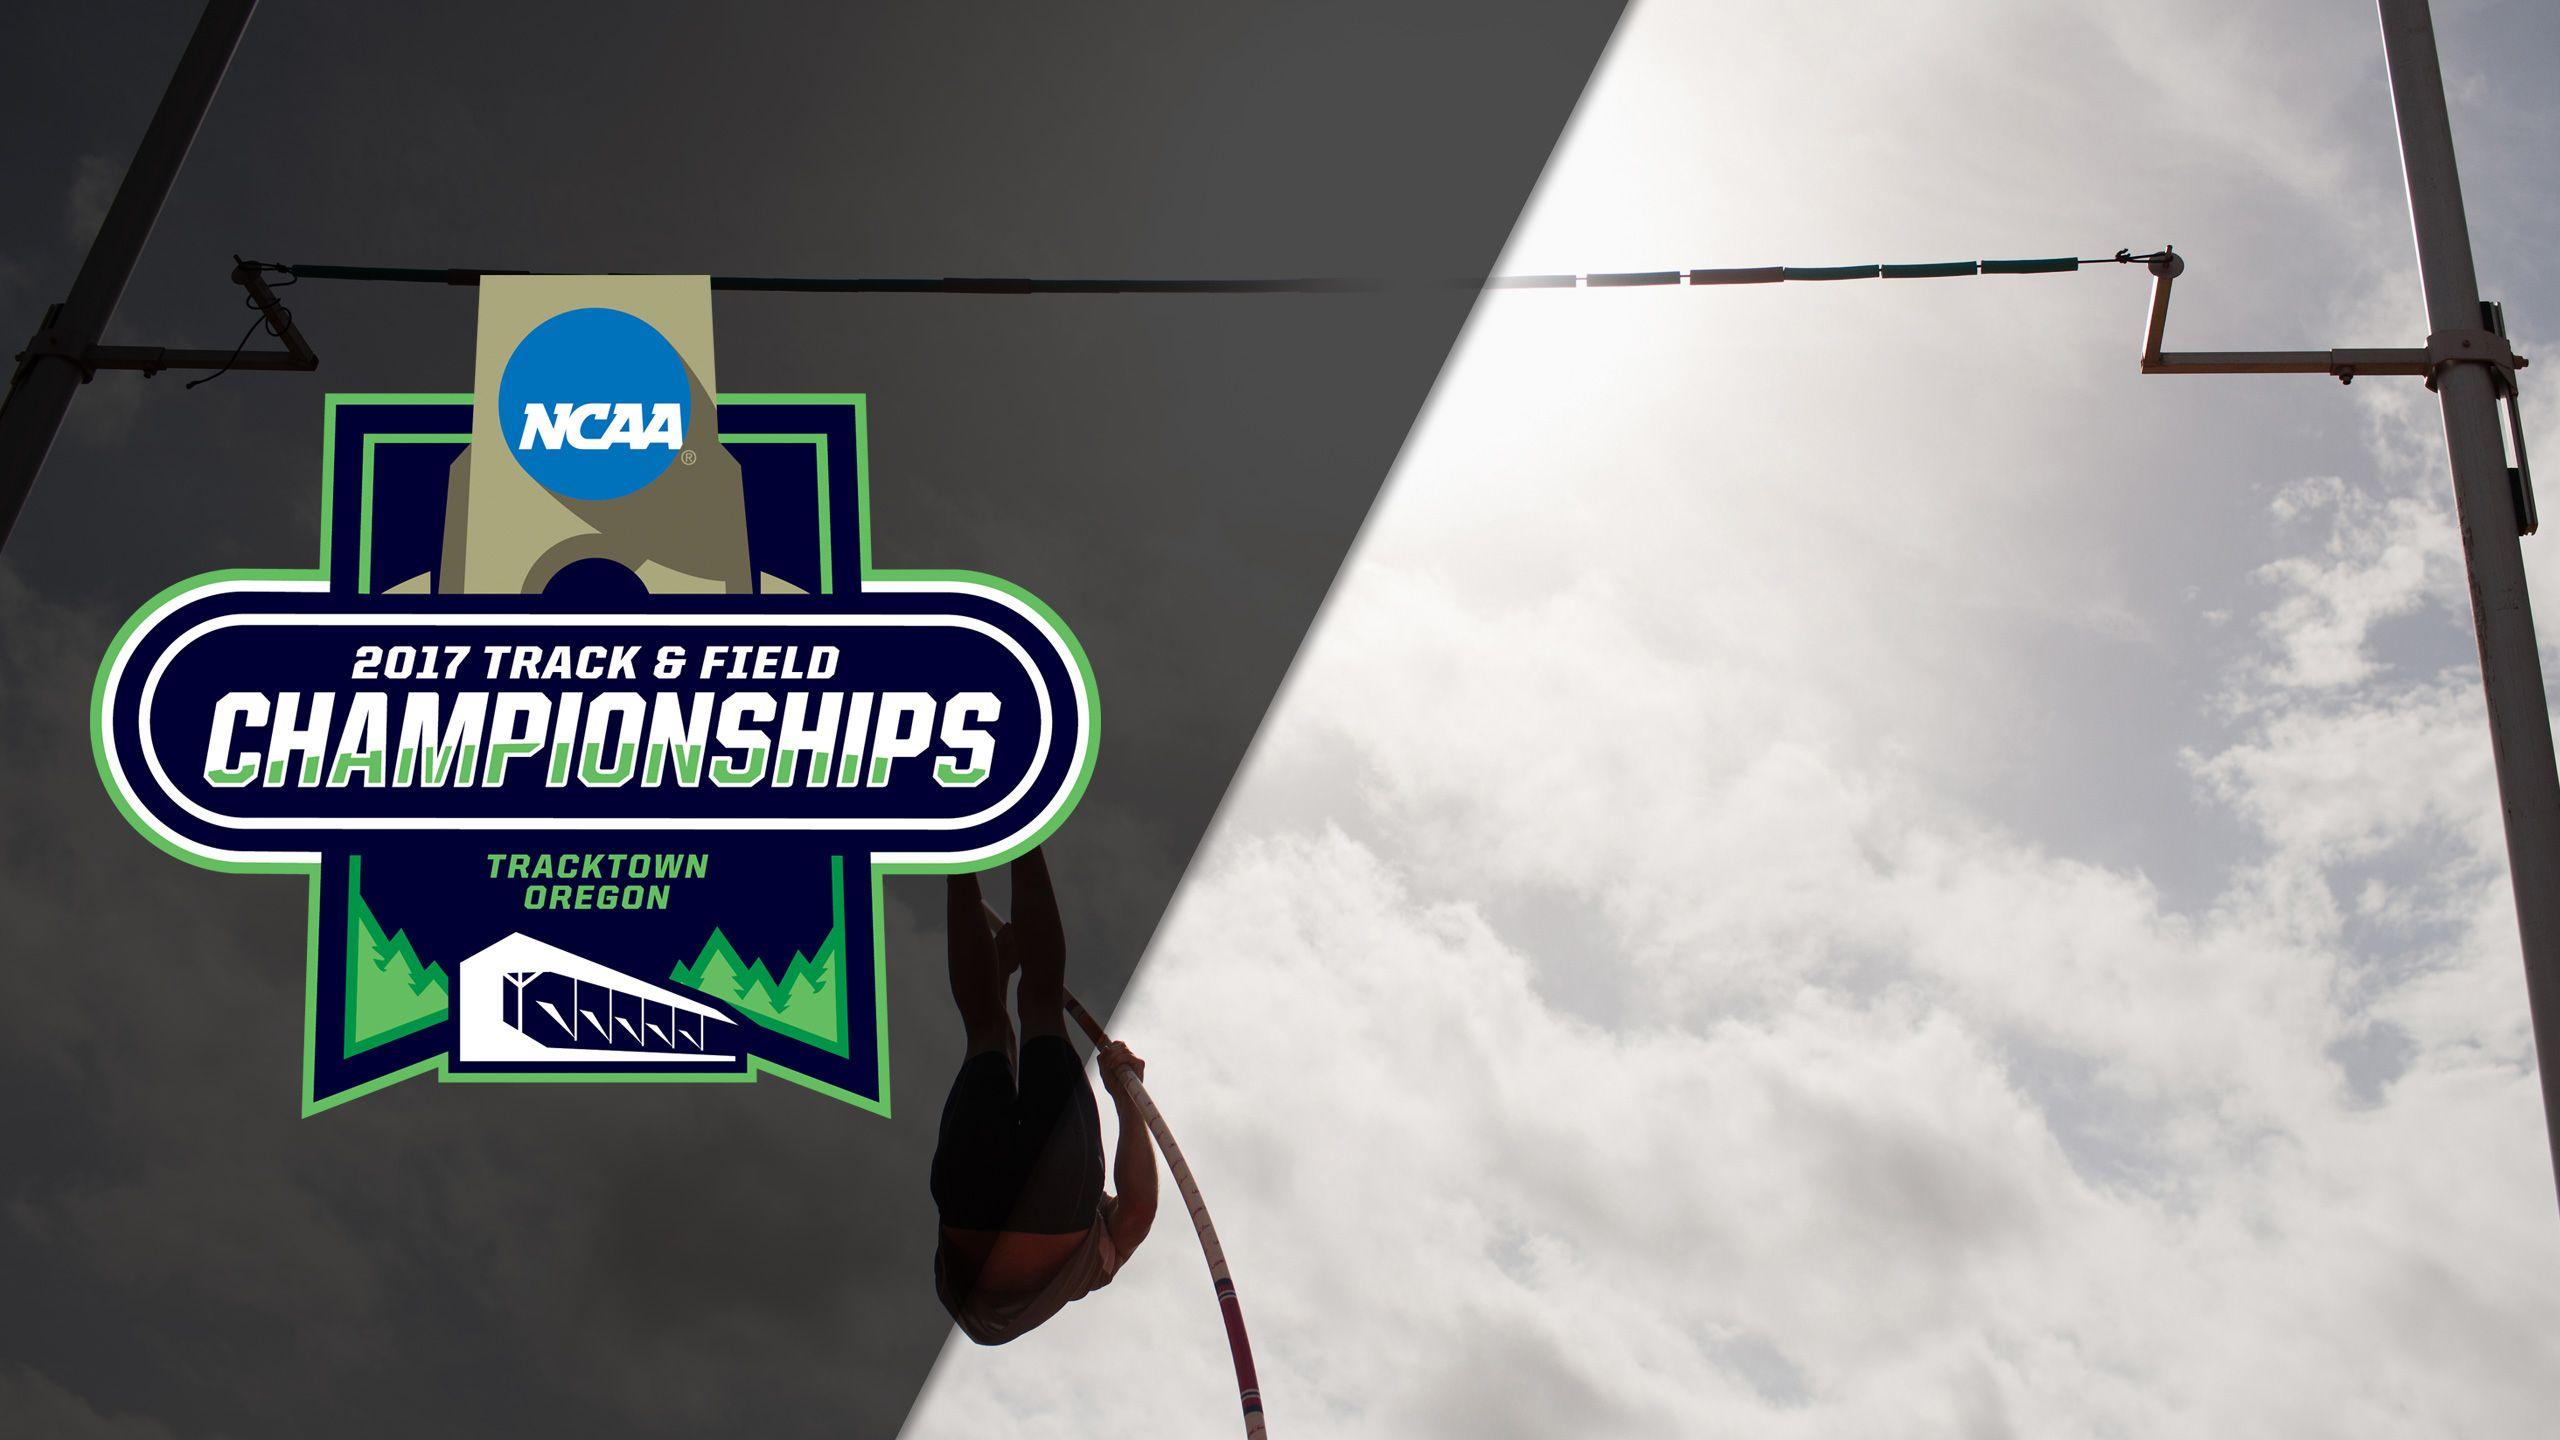 NCAA Track & Field Outdoor Championships - Decathlon: Pole Vault (Flight 2)